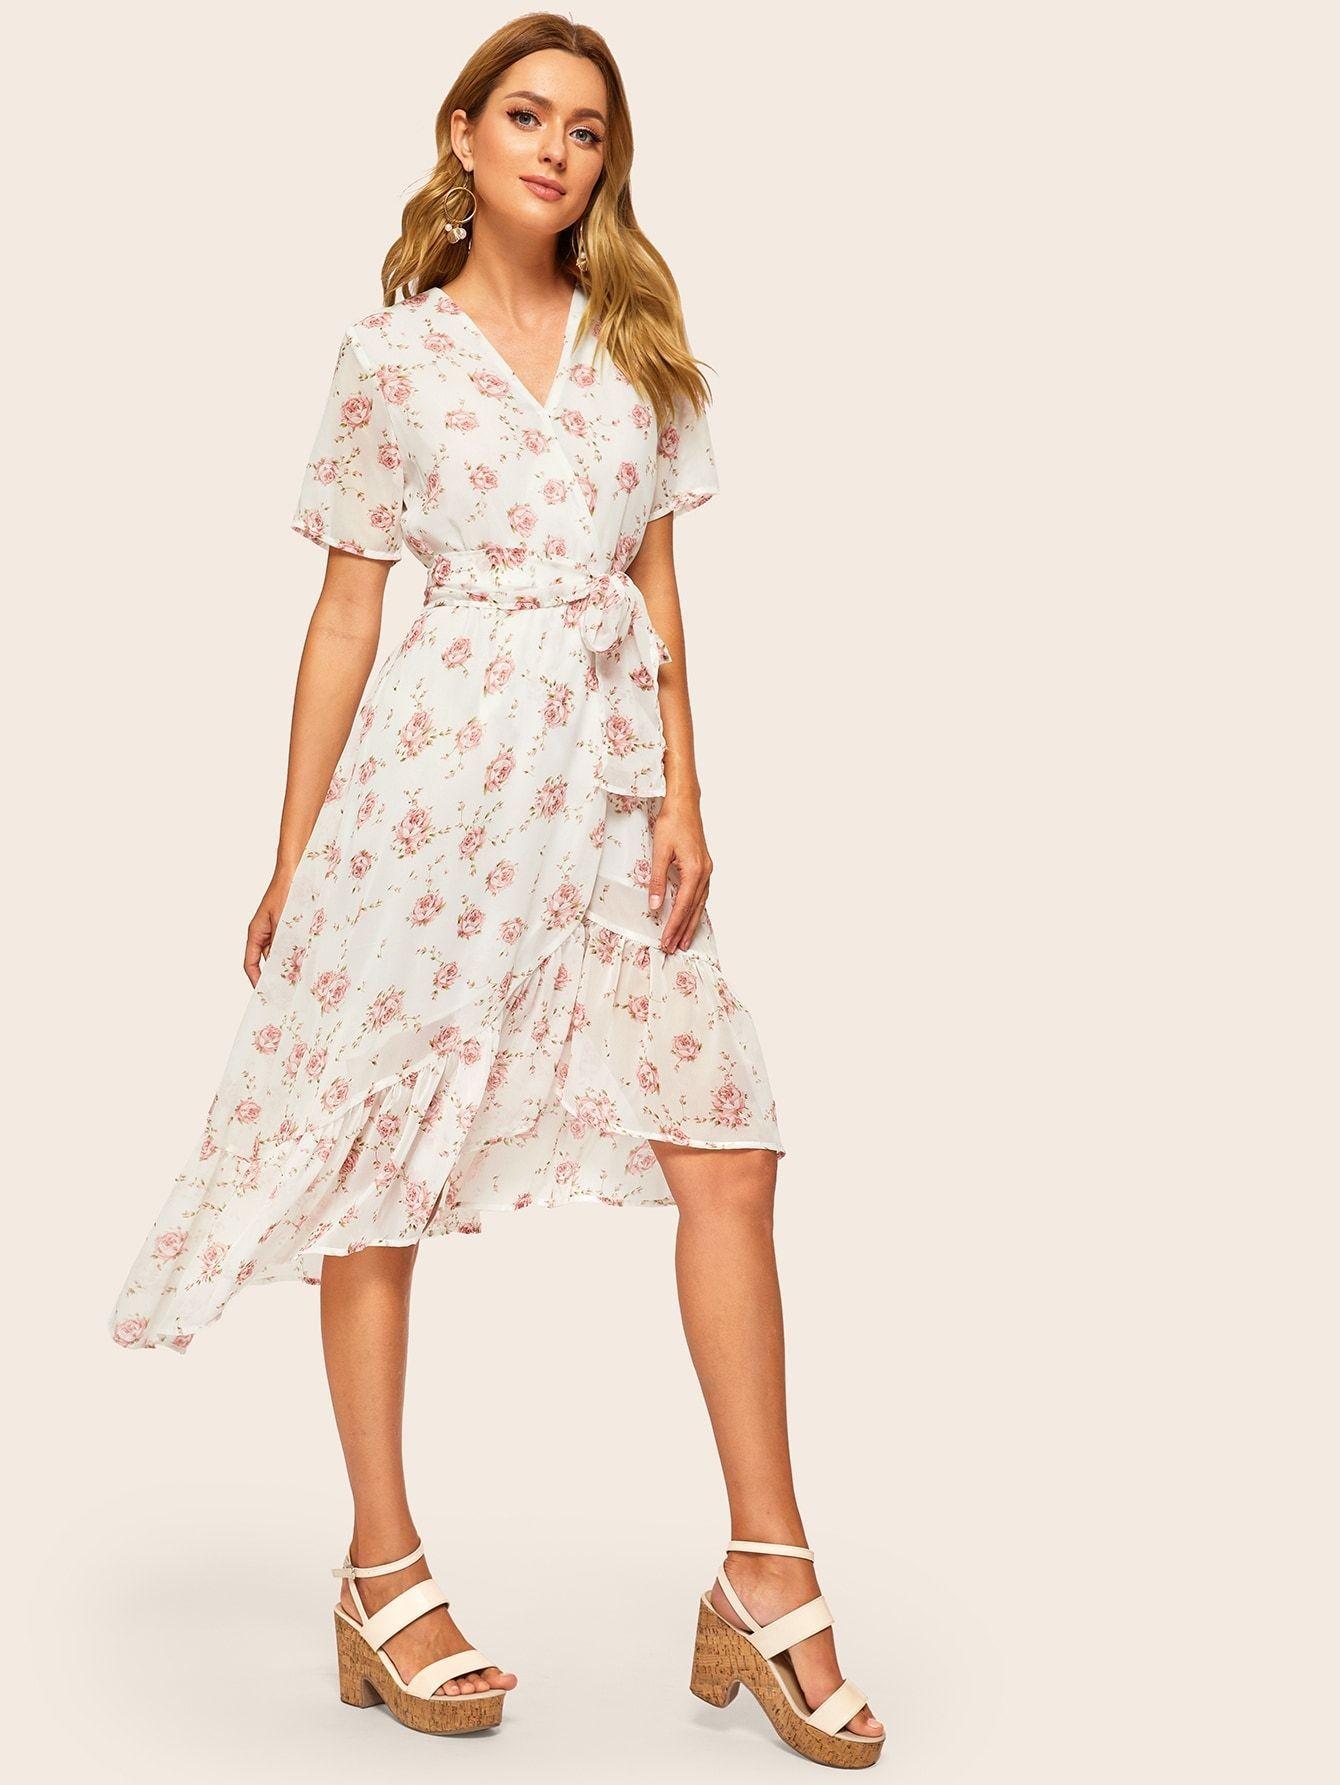 Surplice Floral Print Belted Asymmetrical Hem Wrap Dress Wrap Dress Wrap Dress Floral Surplice Wrap Dress [ 1785 x 1340 Pixel ]